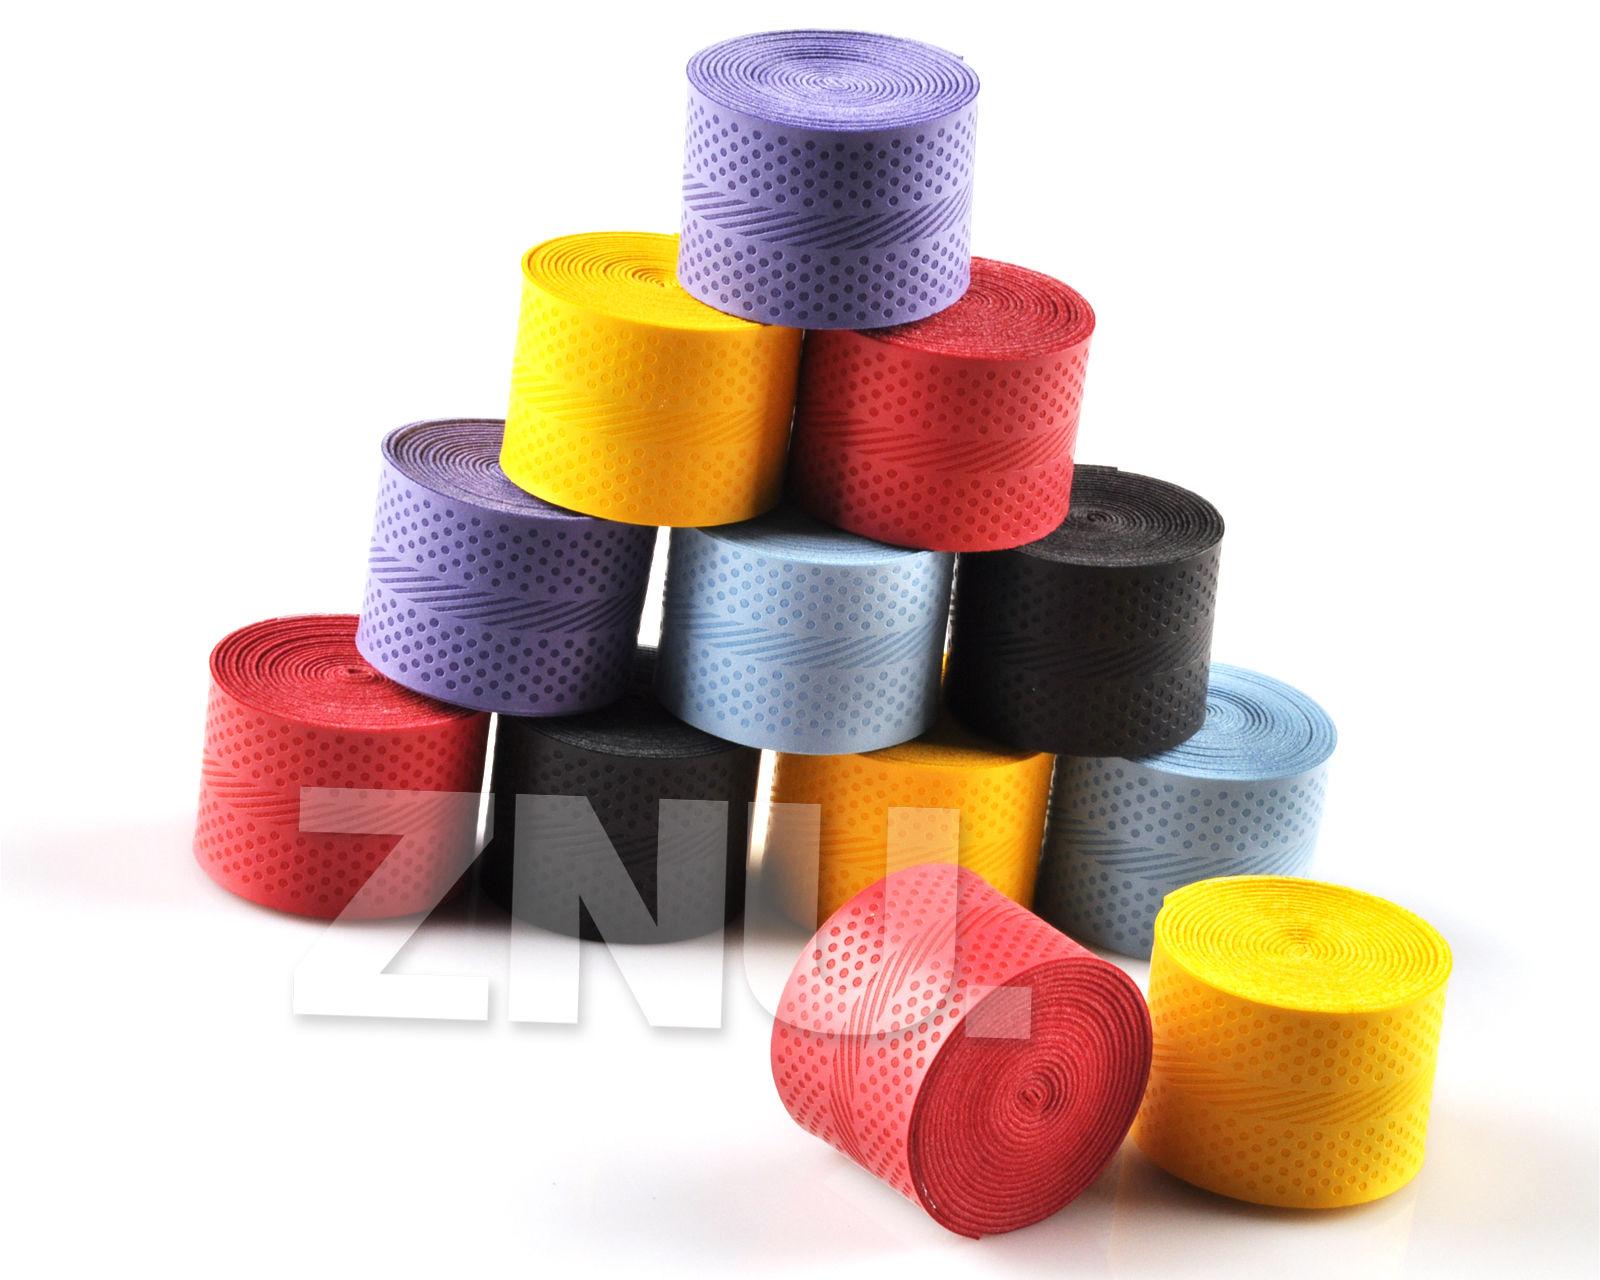 1-10pcs Anti Slip Racket Over Grip Roll Tennis Badminton Squash Handle Tape Lots